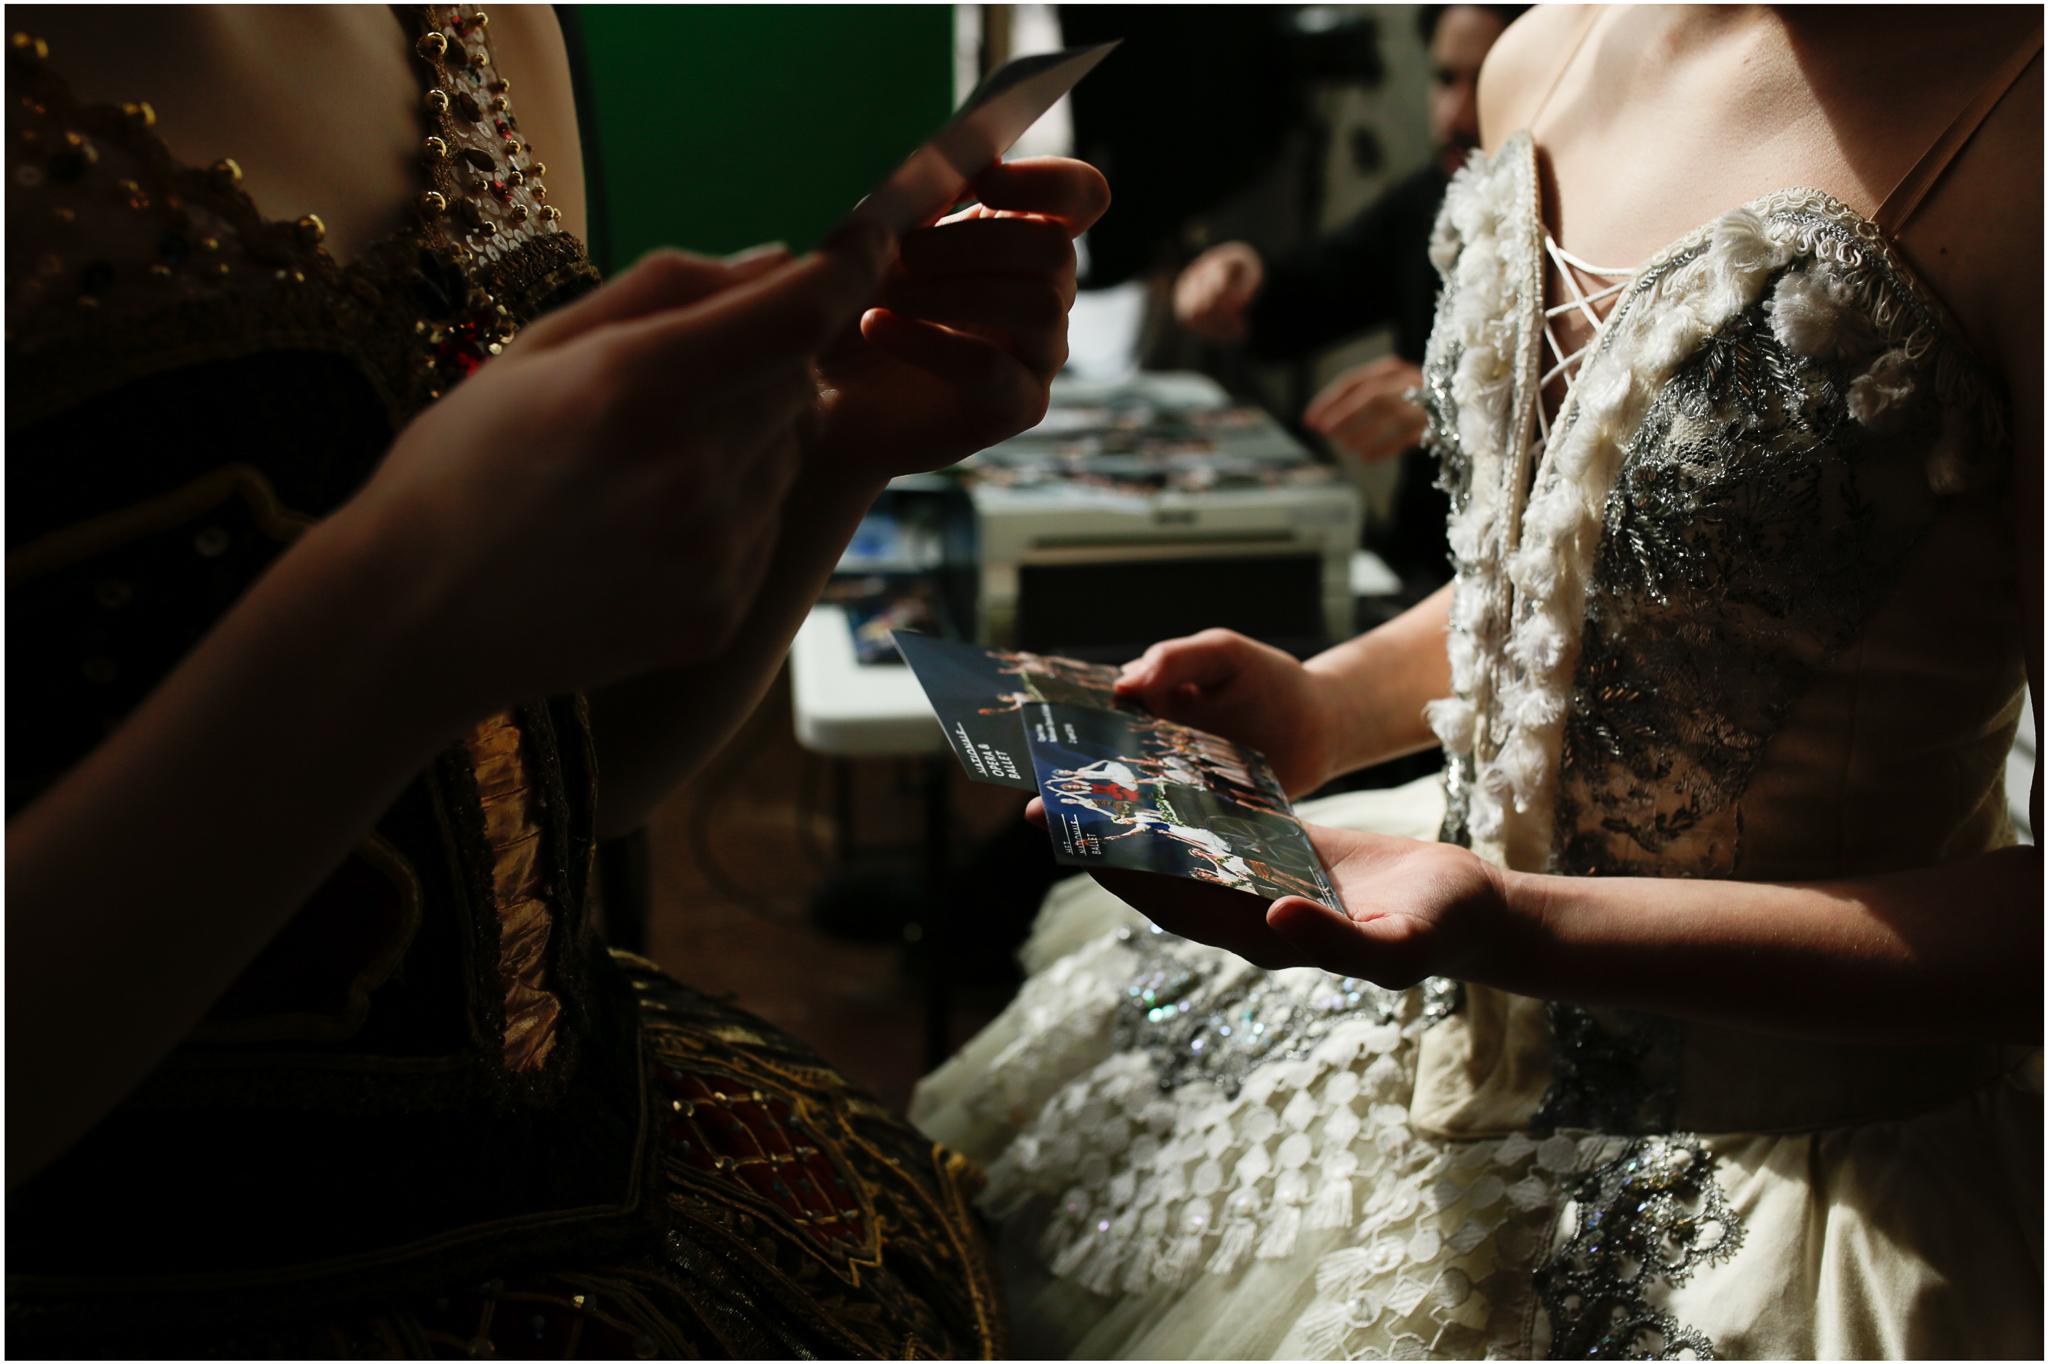 023_Fotografie Nationale Opera Ballet.jpg